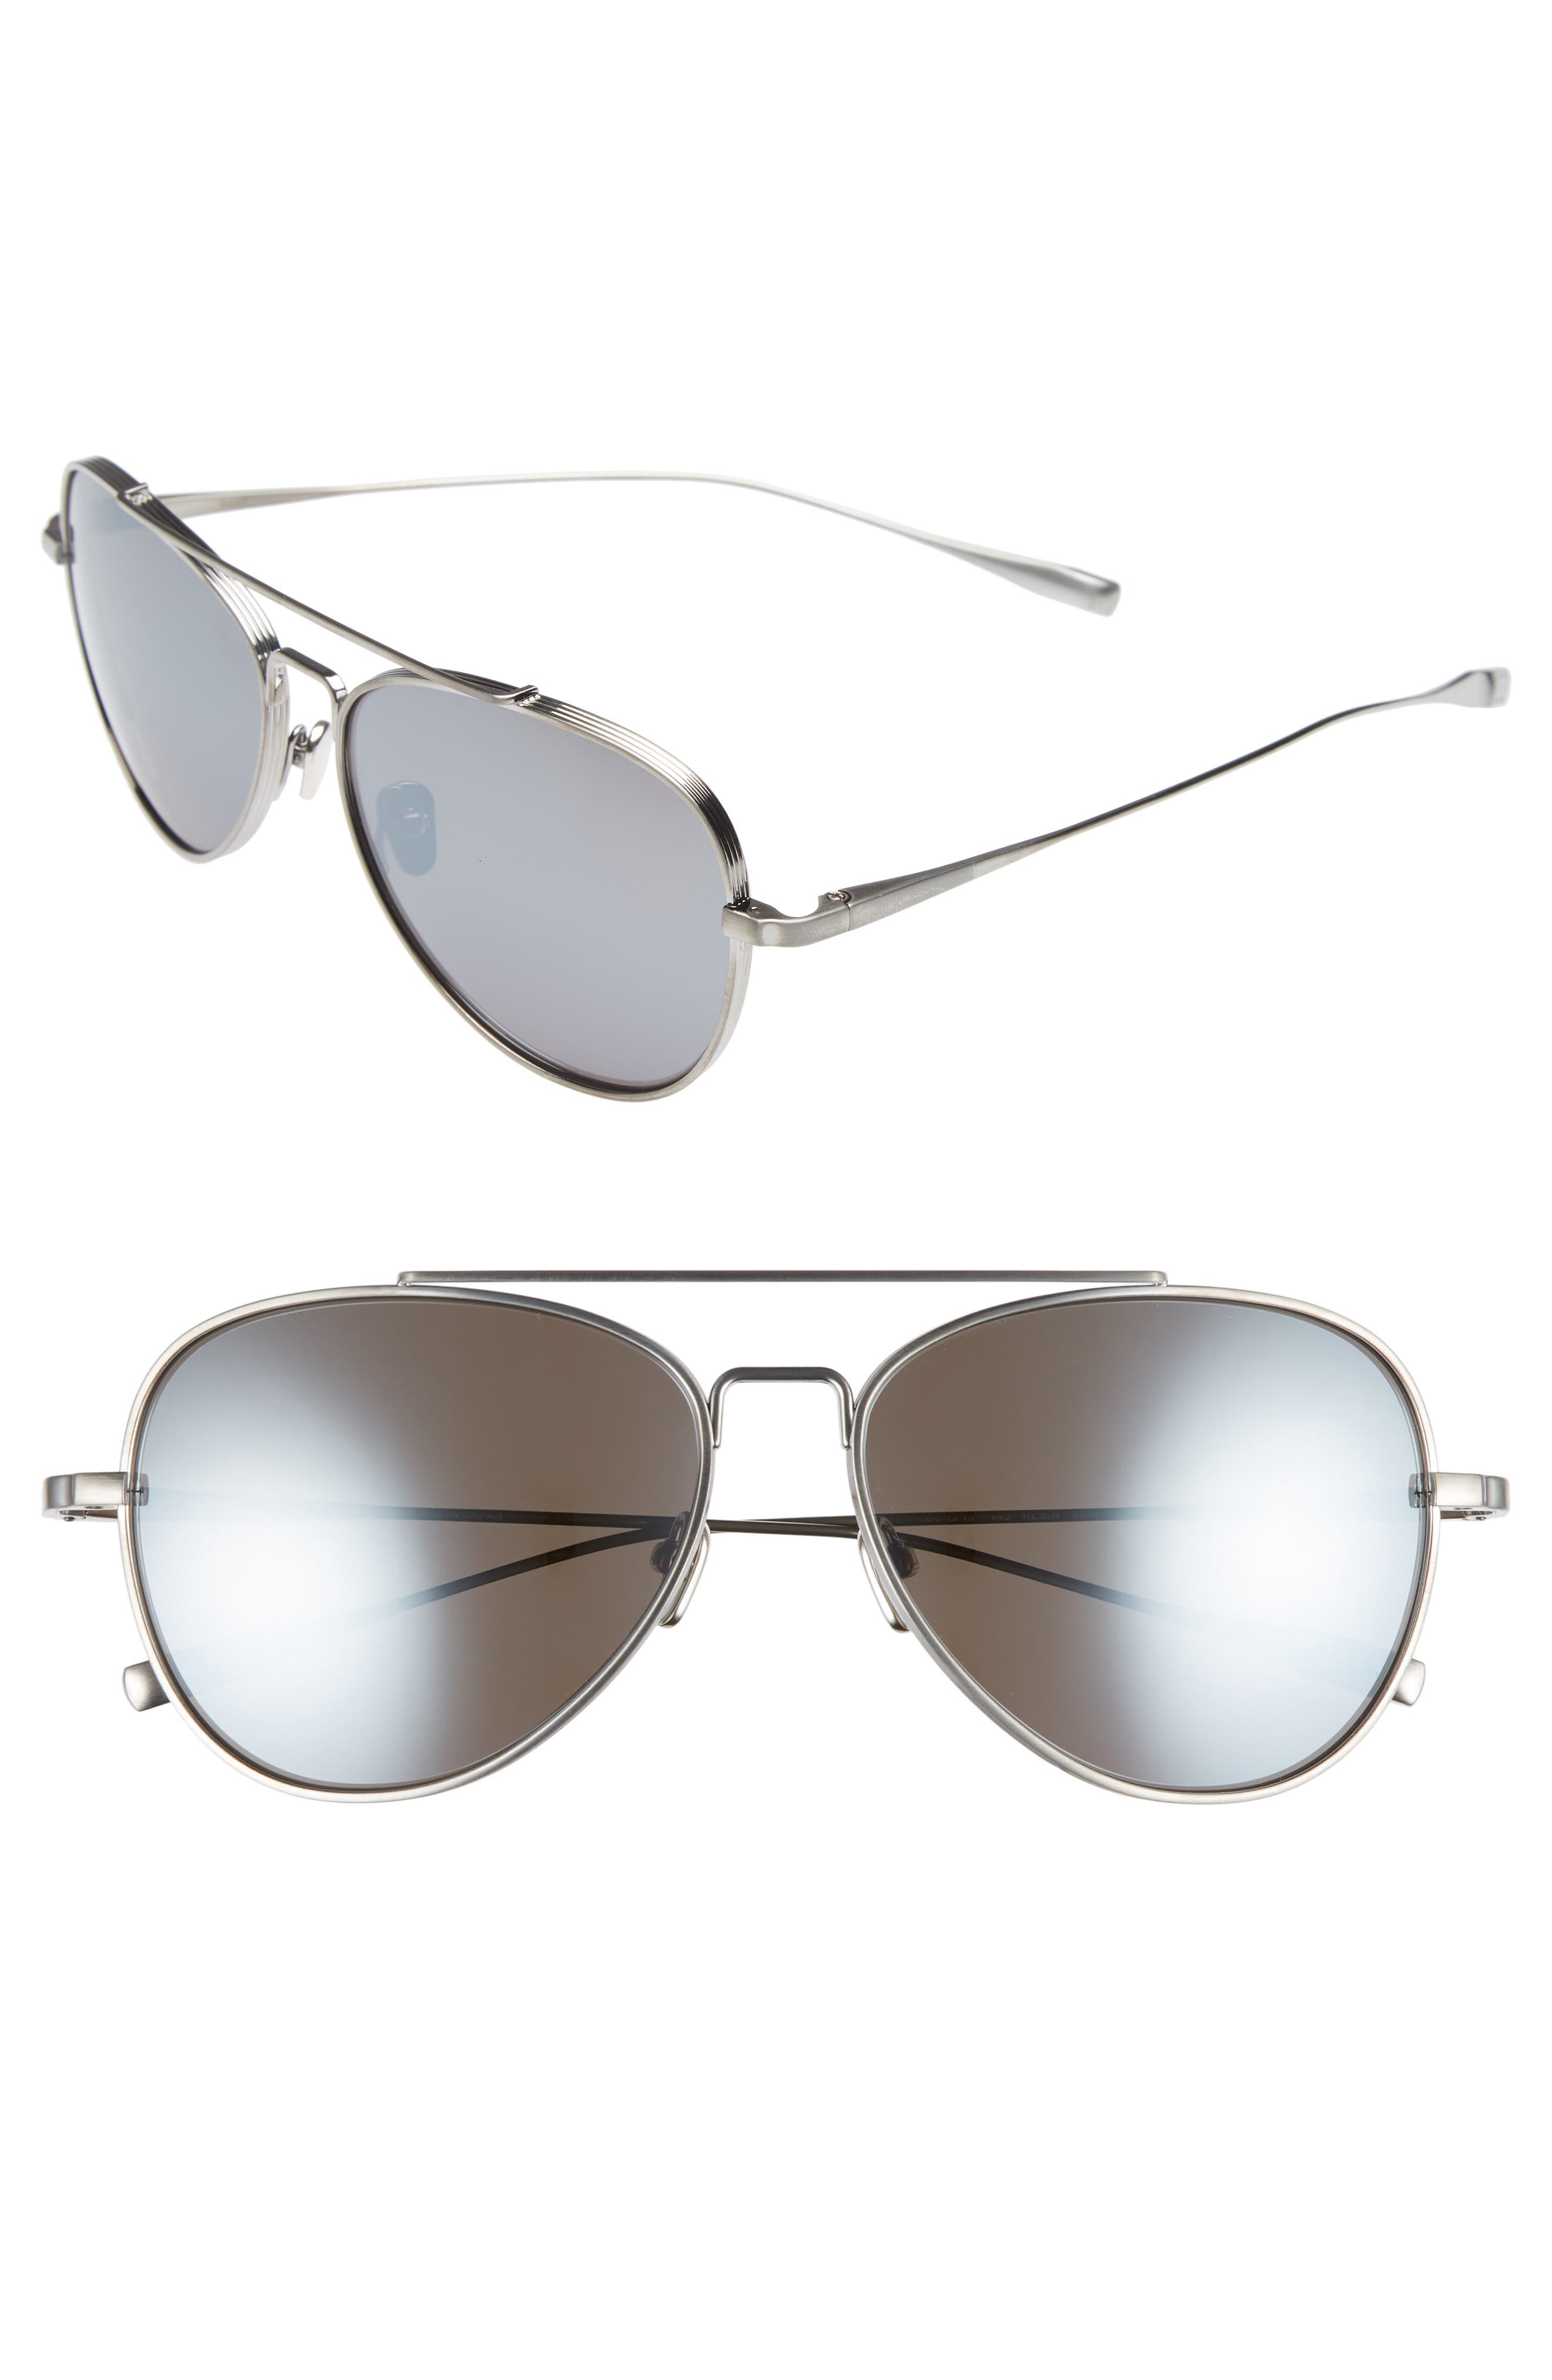 60mm Polarized Aviator Sunglasses,                             Main thumbnail 1, color,                             Tempest